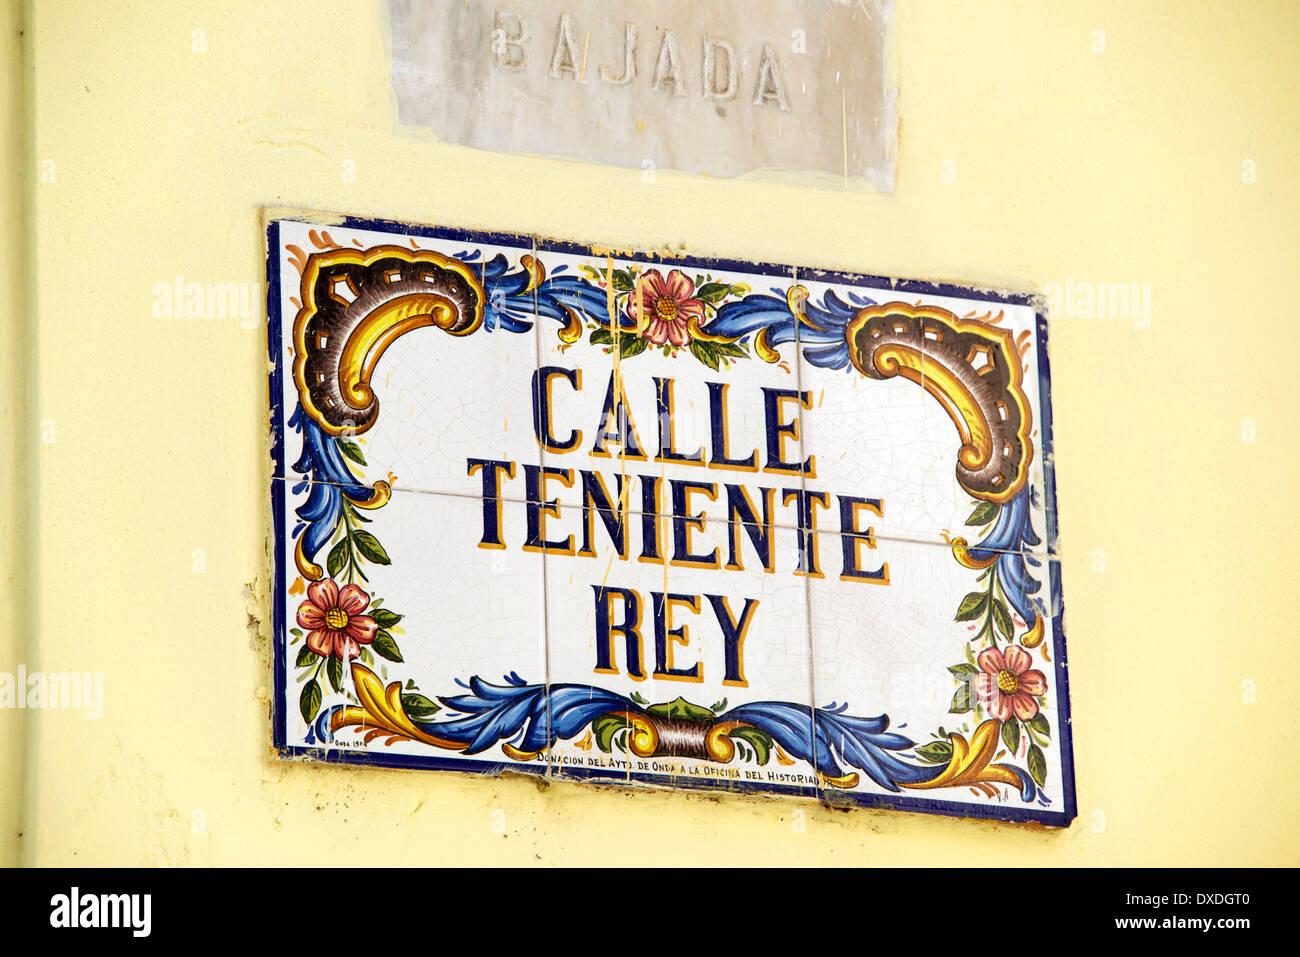 Majolica tile sign Calle Teniente Rey Old Havana Cuba - Stock Image